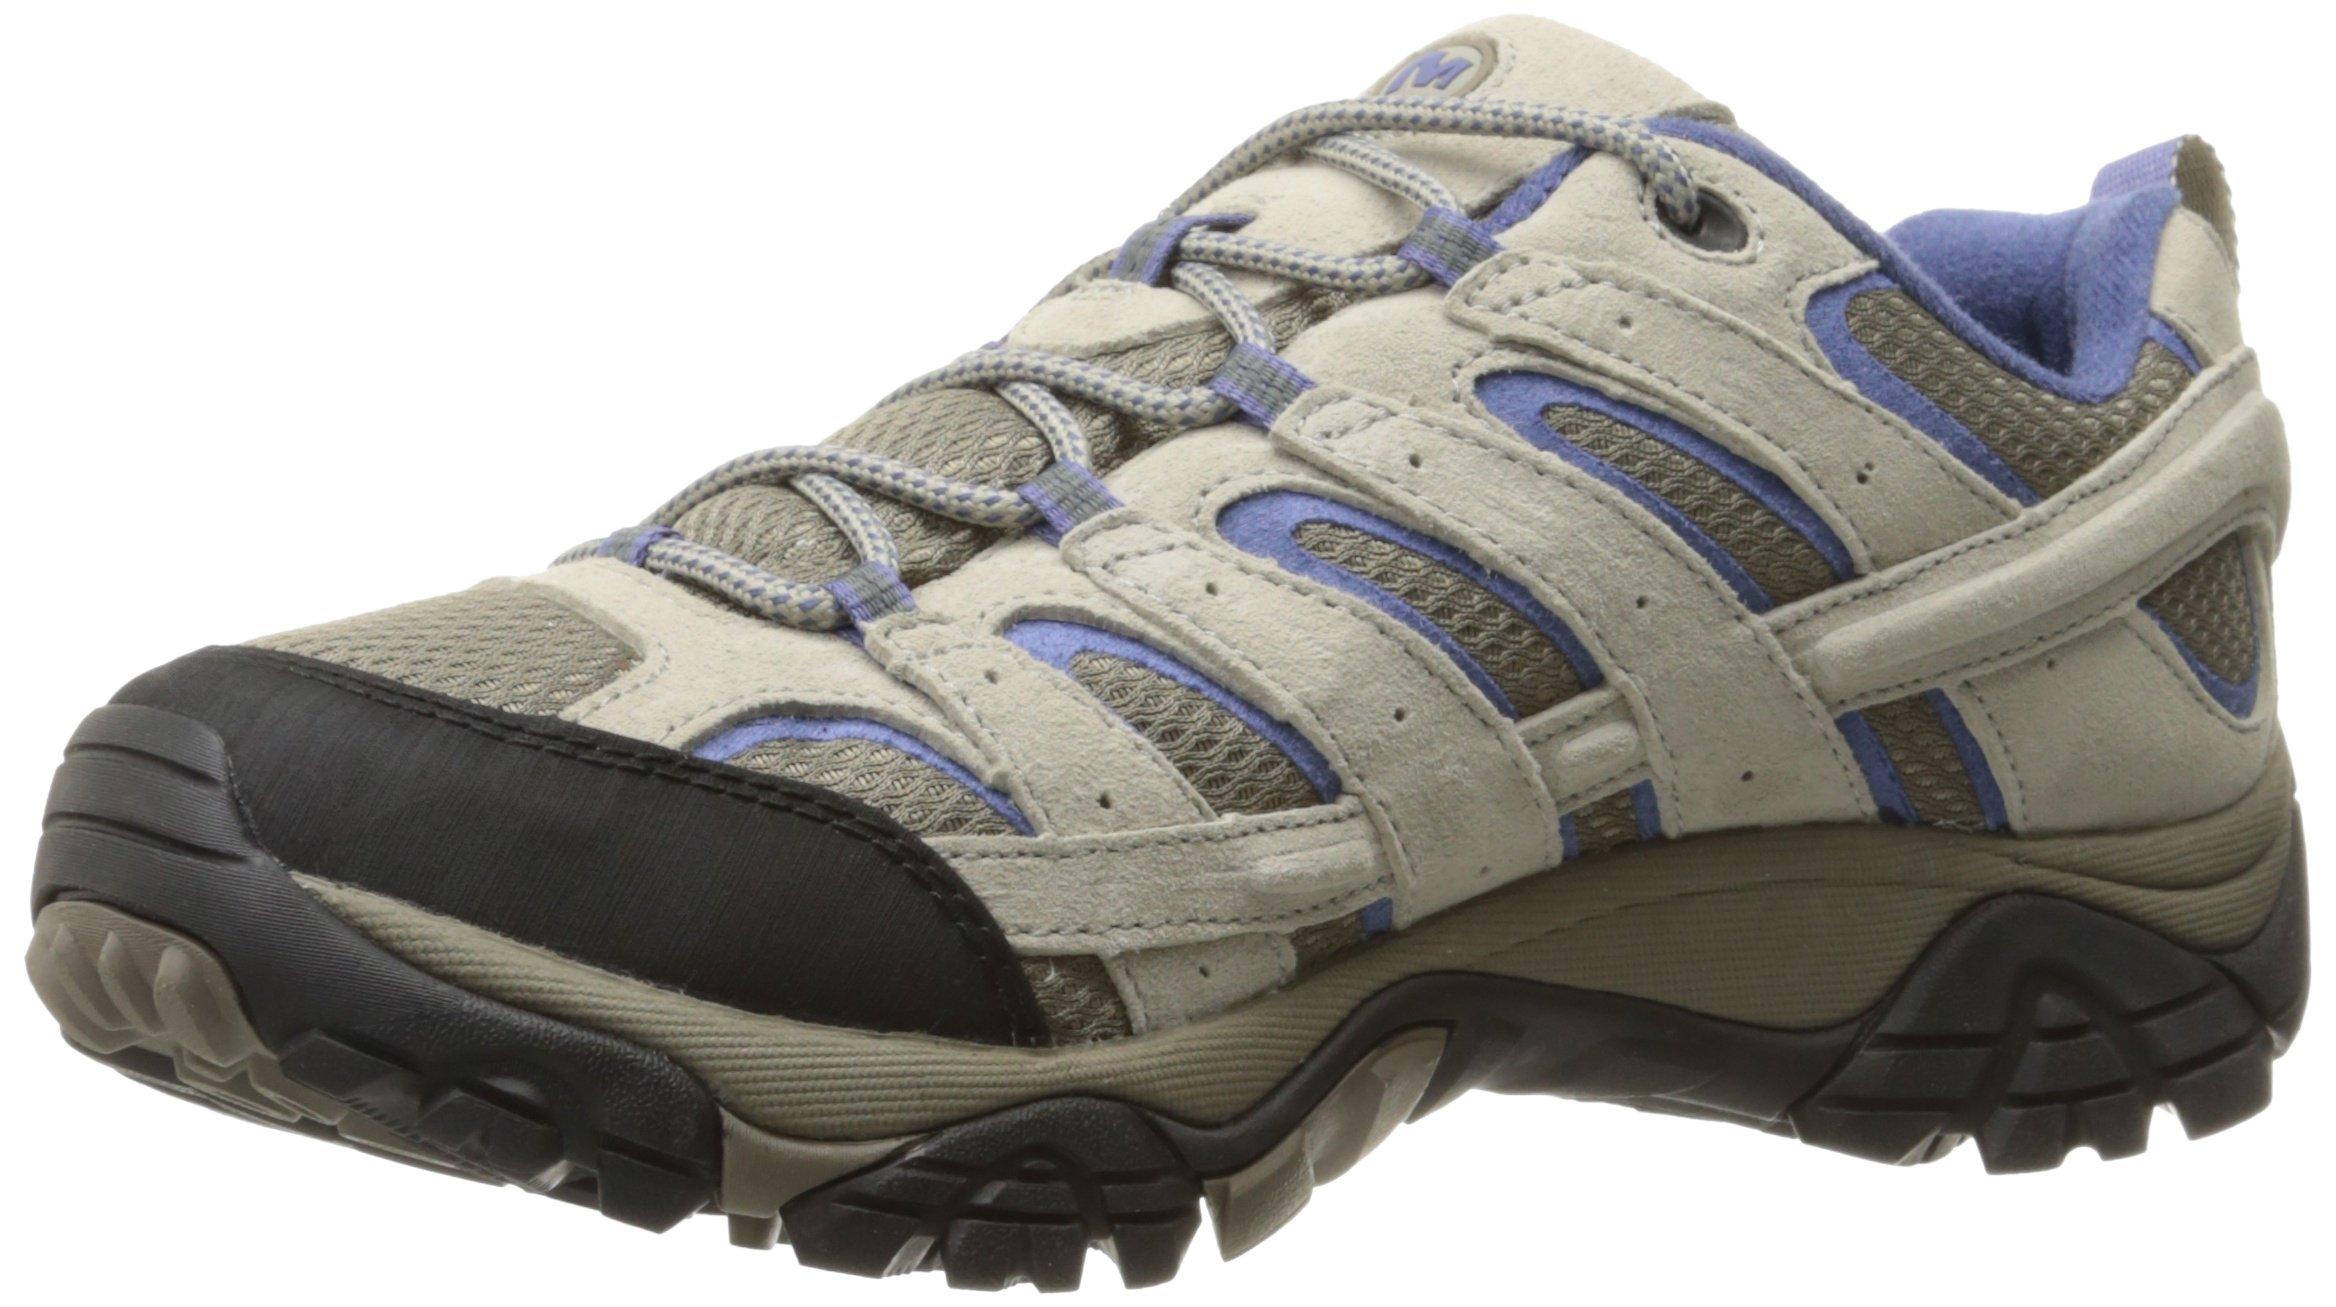 Merrell Women's Moab 2 Vent Hiking Shoe, Aluminum/Marlin, 5 W US